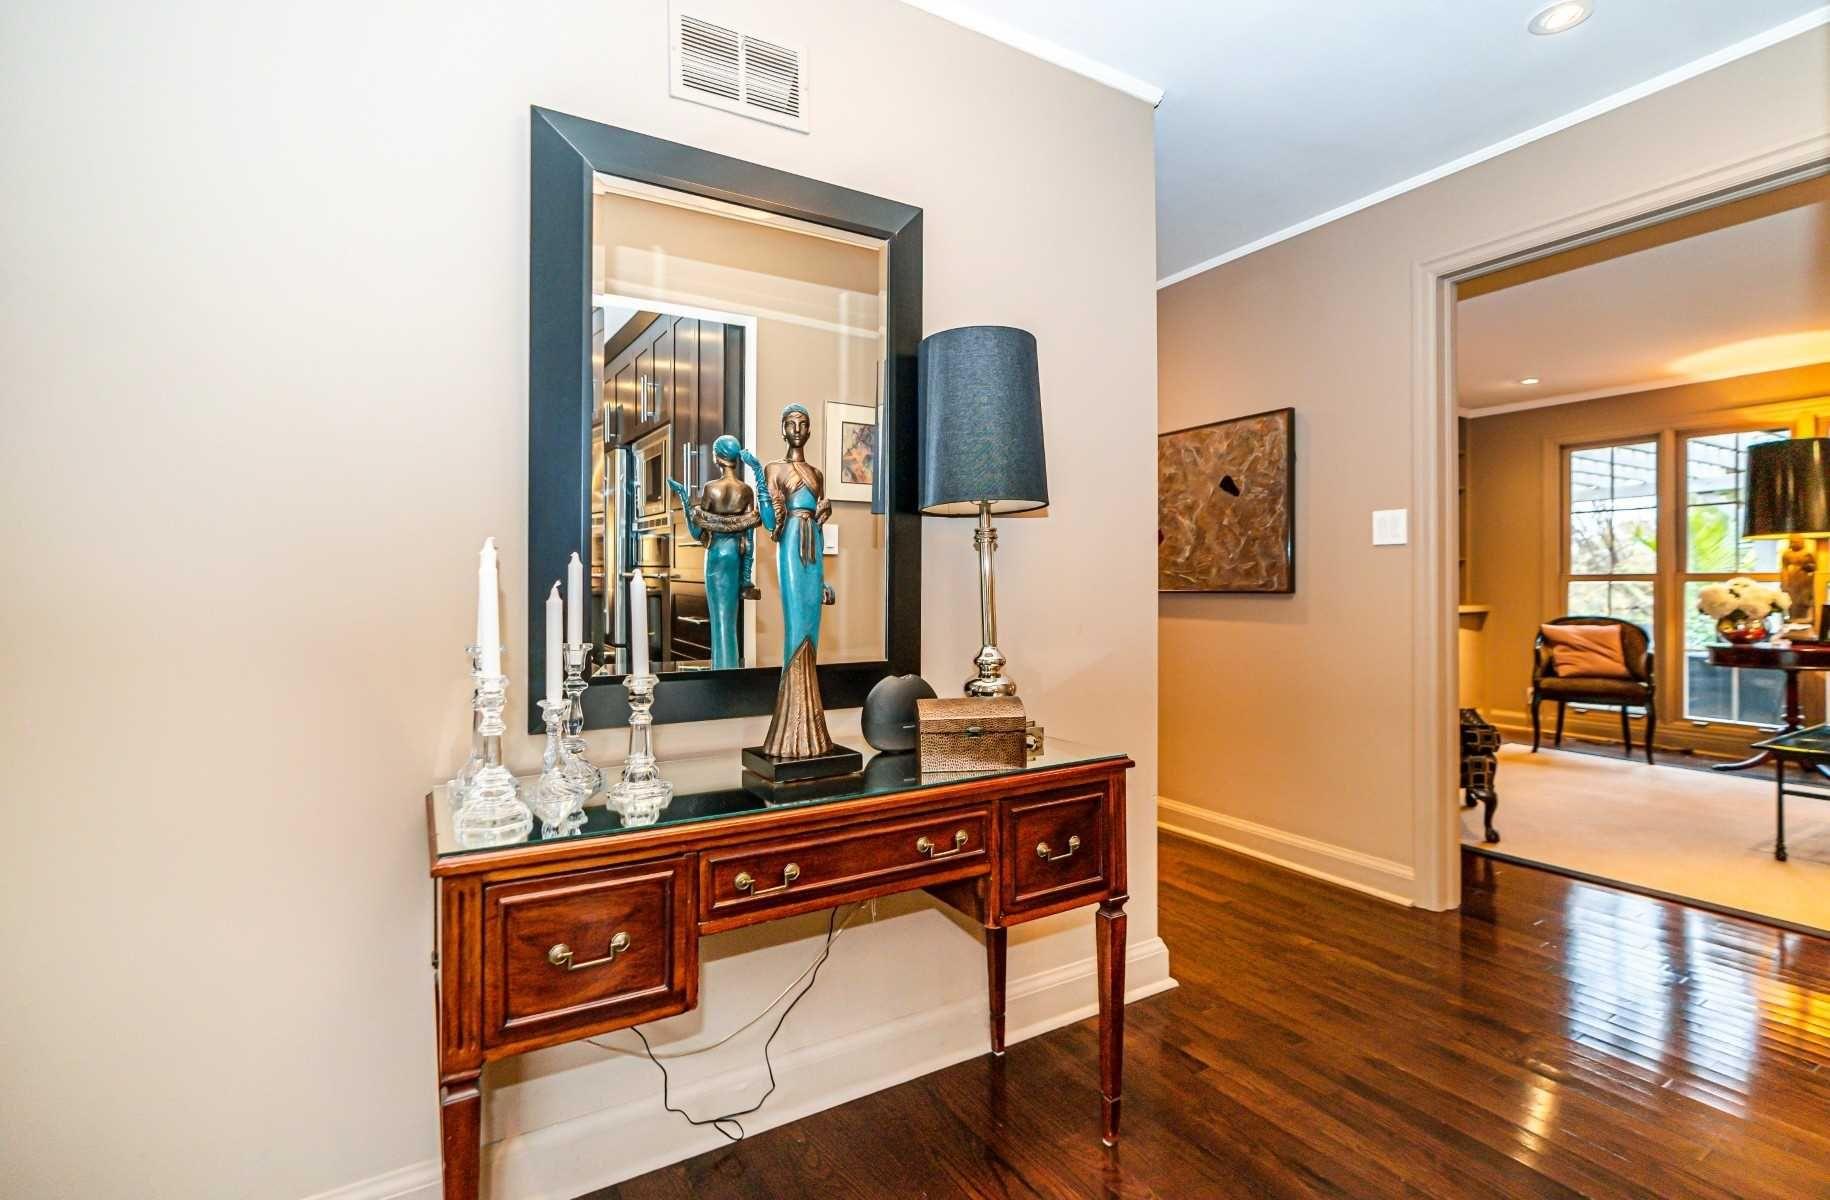 Photo 3: Photos: 782 Bessborough Drive in Oshawa: Centennial House (Bungalow) for sale : MLS®# E4968487